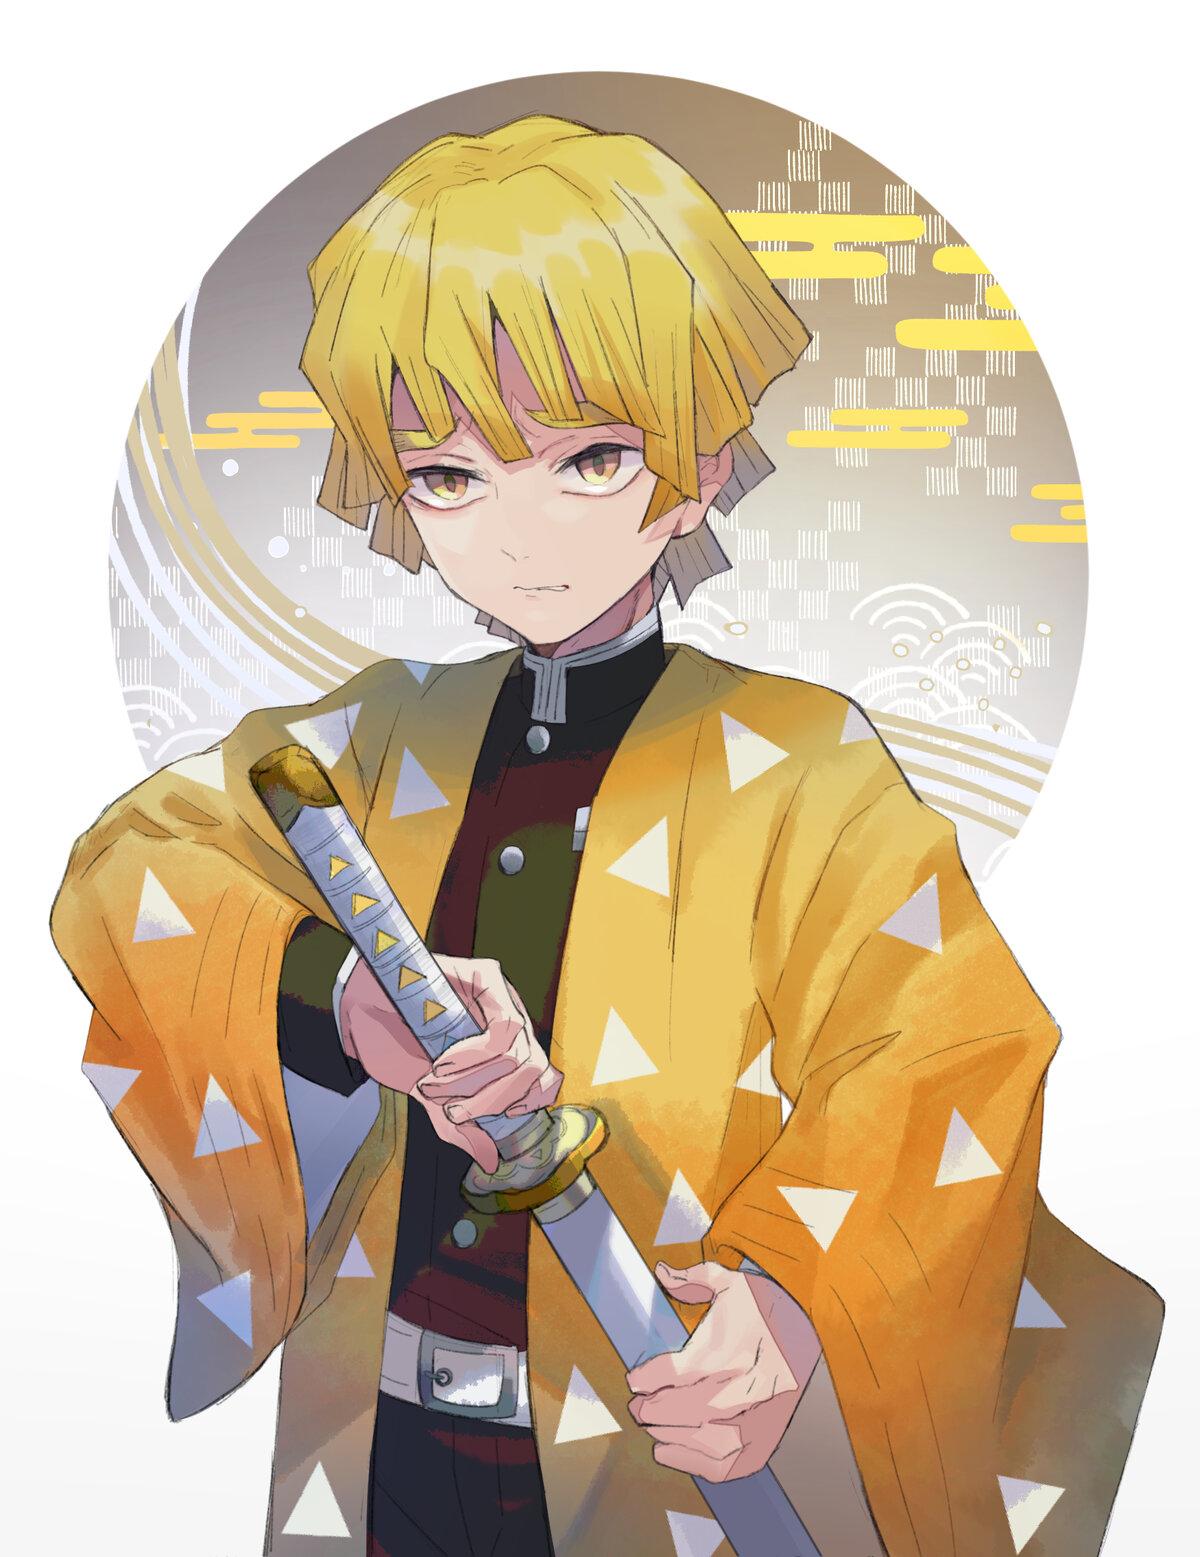 Zenicu Agacuma Iz Anime Klinok Rassekayushij Demonov